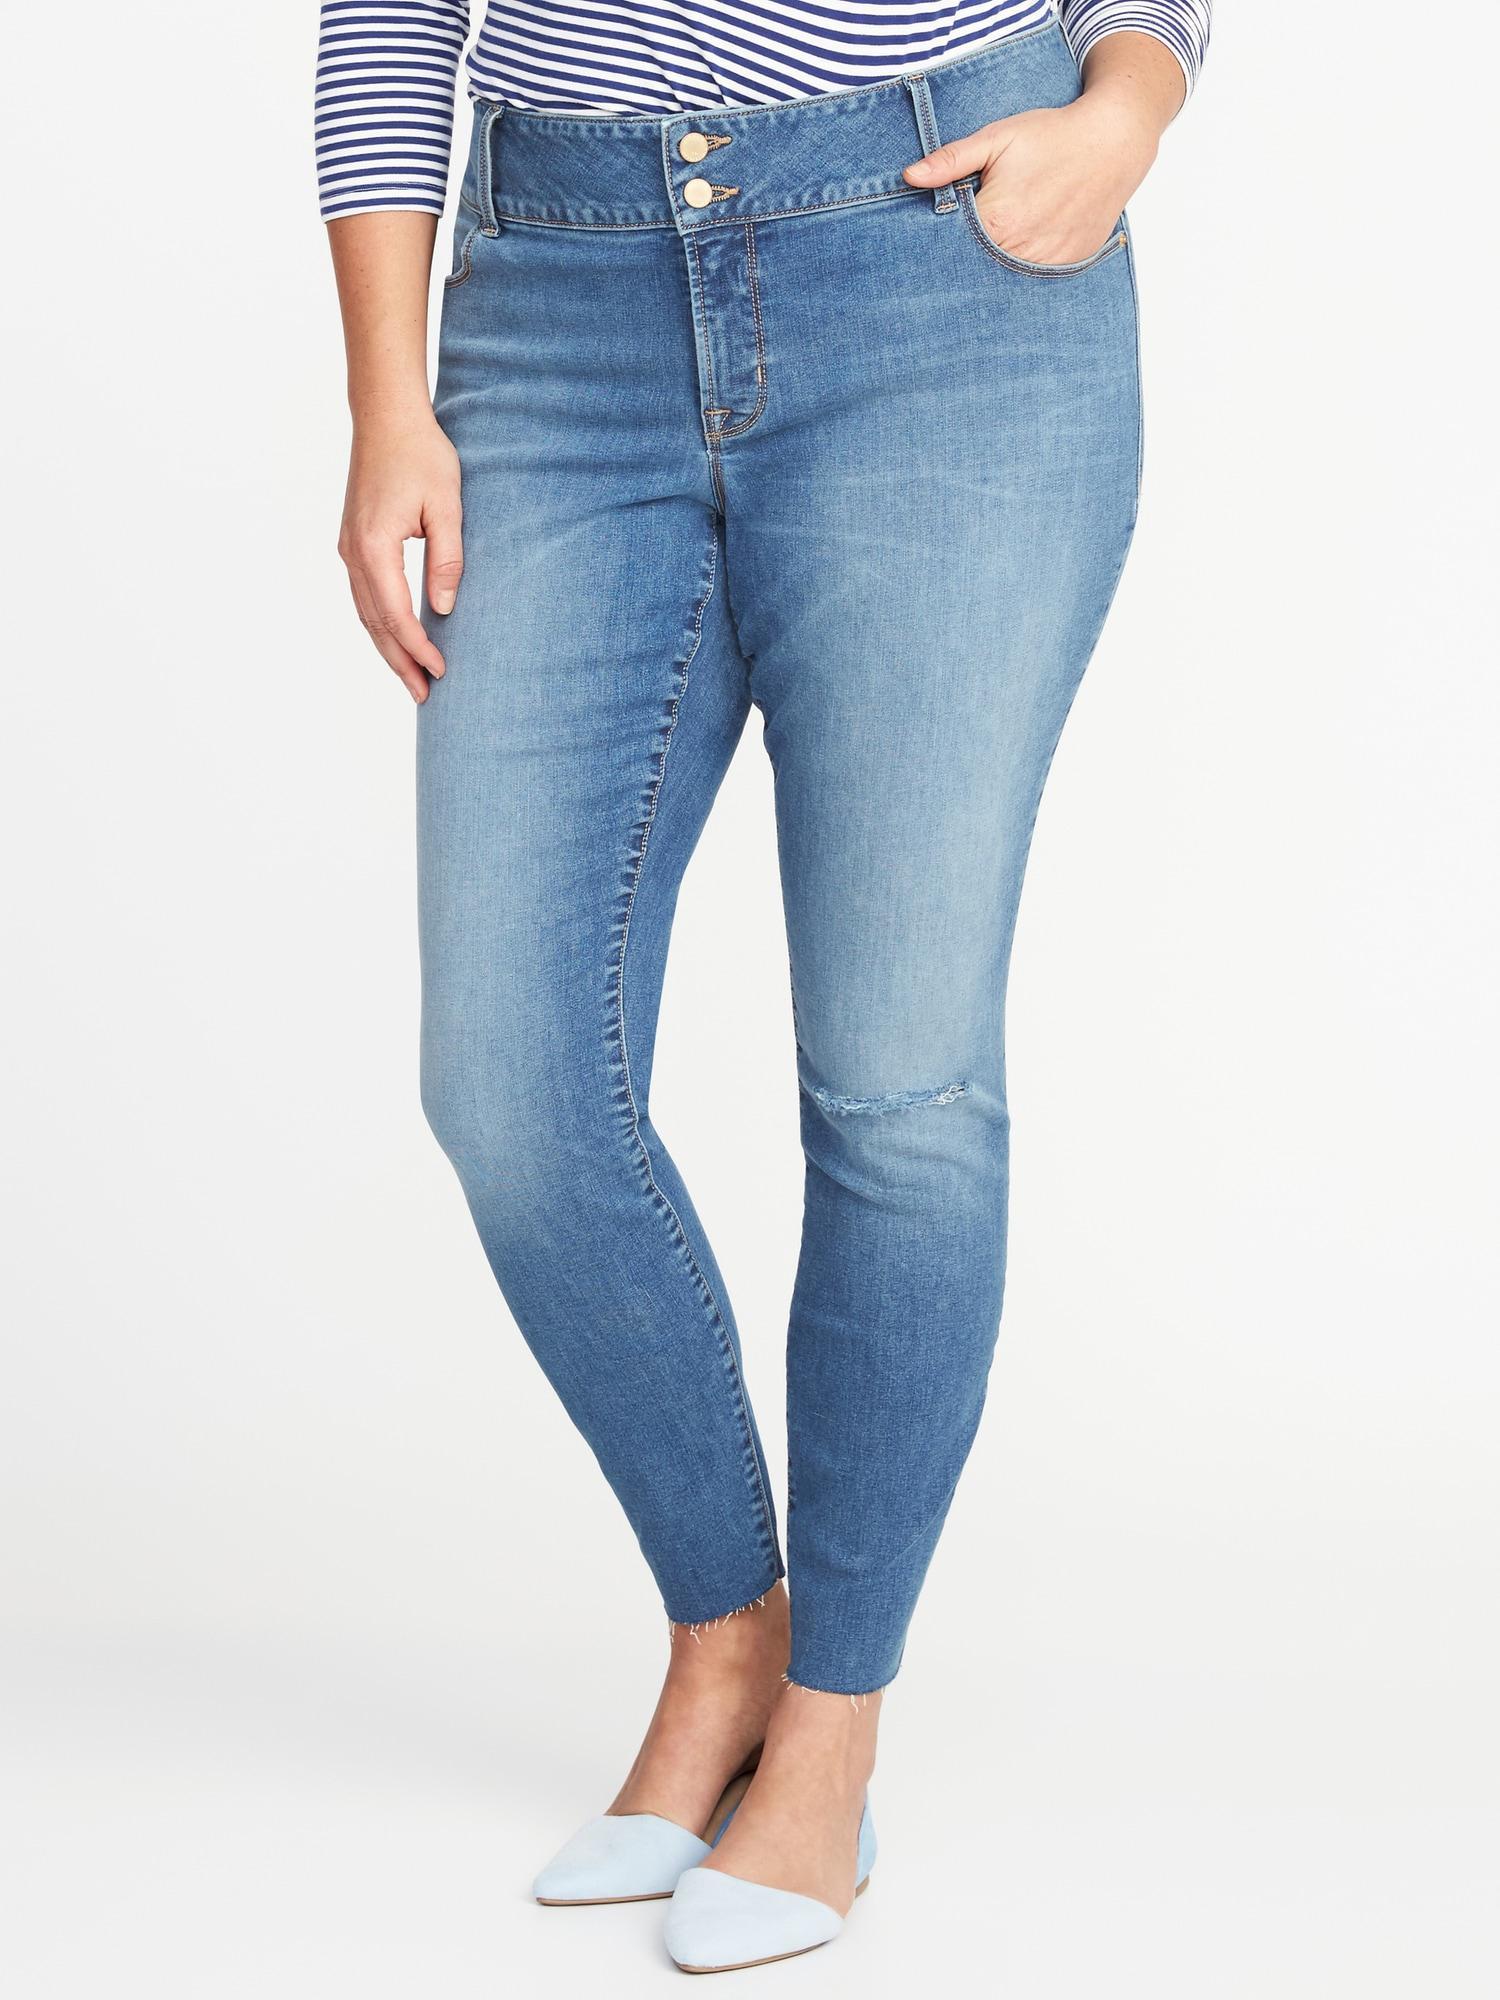 078e416da519f Old Navy. Women s Blue Secret-slim Pockets Plus-size Built-in Sculpt High-rise  Rockstar Jeans